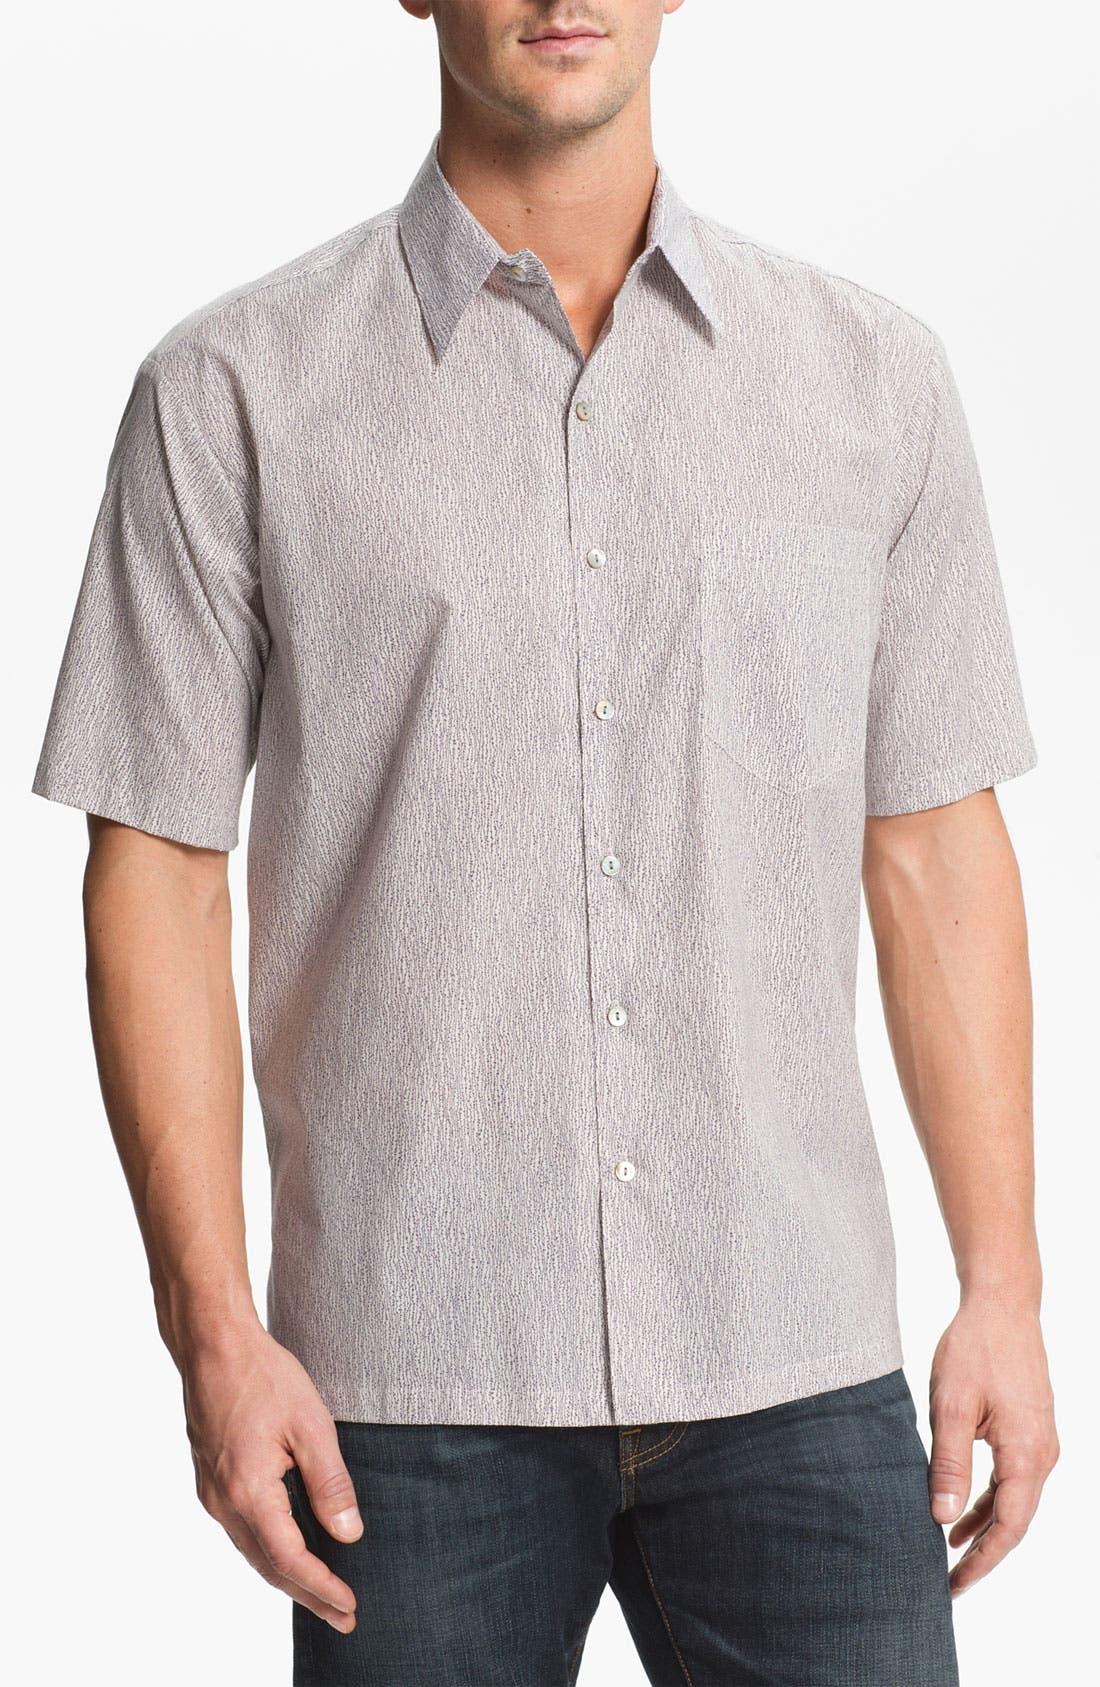 Alternate Image 1 Selected - Tori Richard 'Ivy League' Regular Fit Sport Shirt